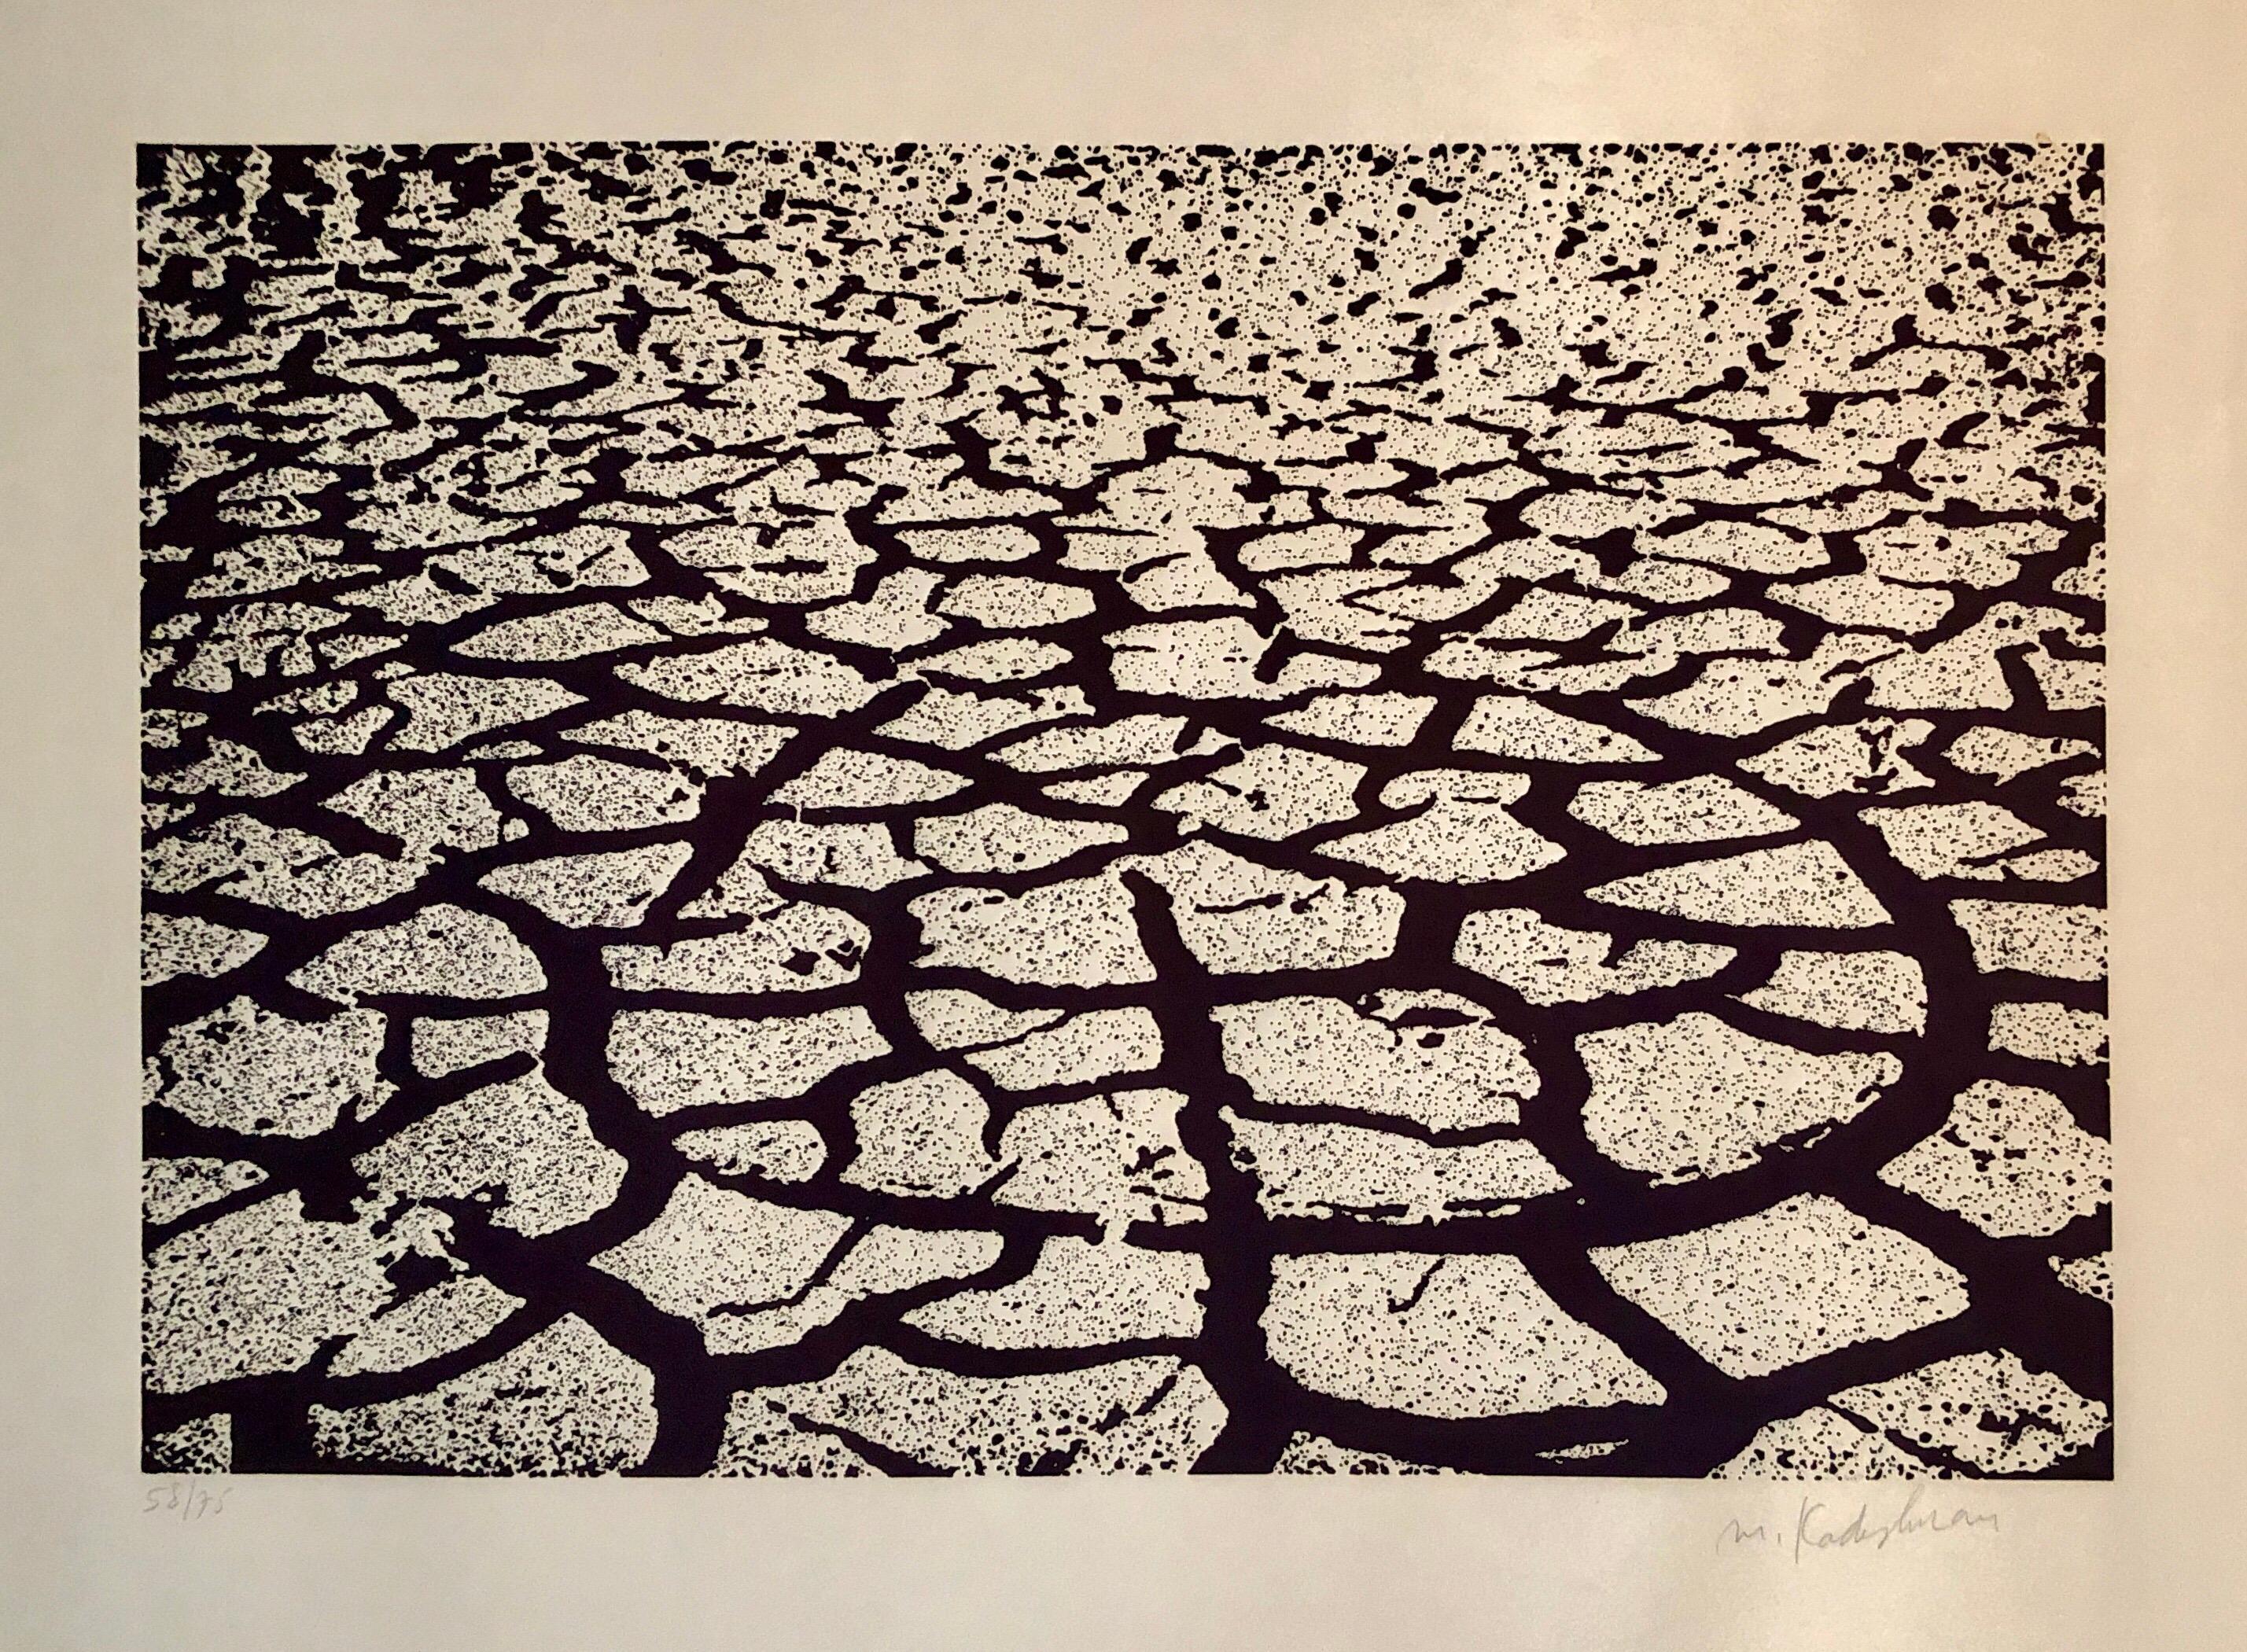 Israeli Modern Pop Art Aquatint Etching Cracked Earth Art Kadishman Lithograph